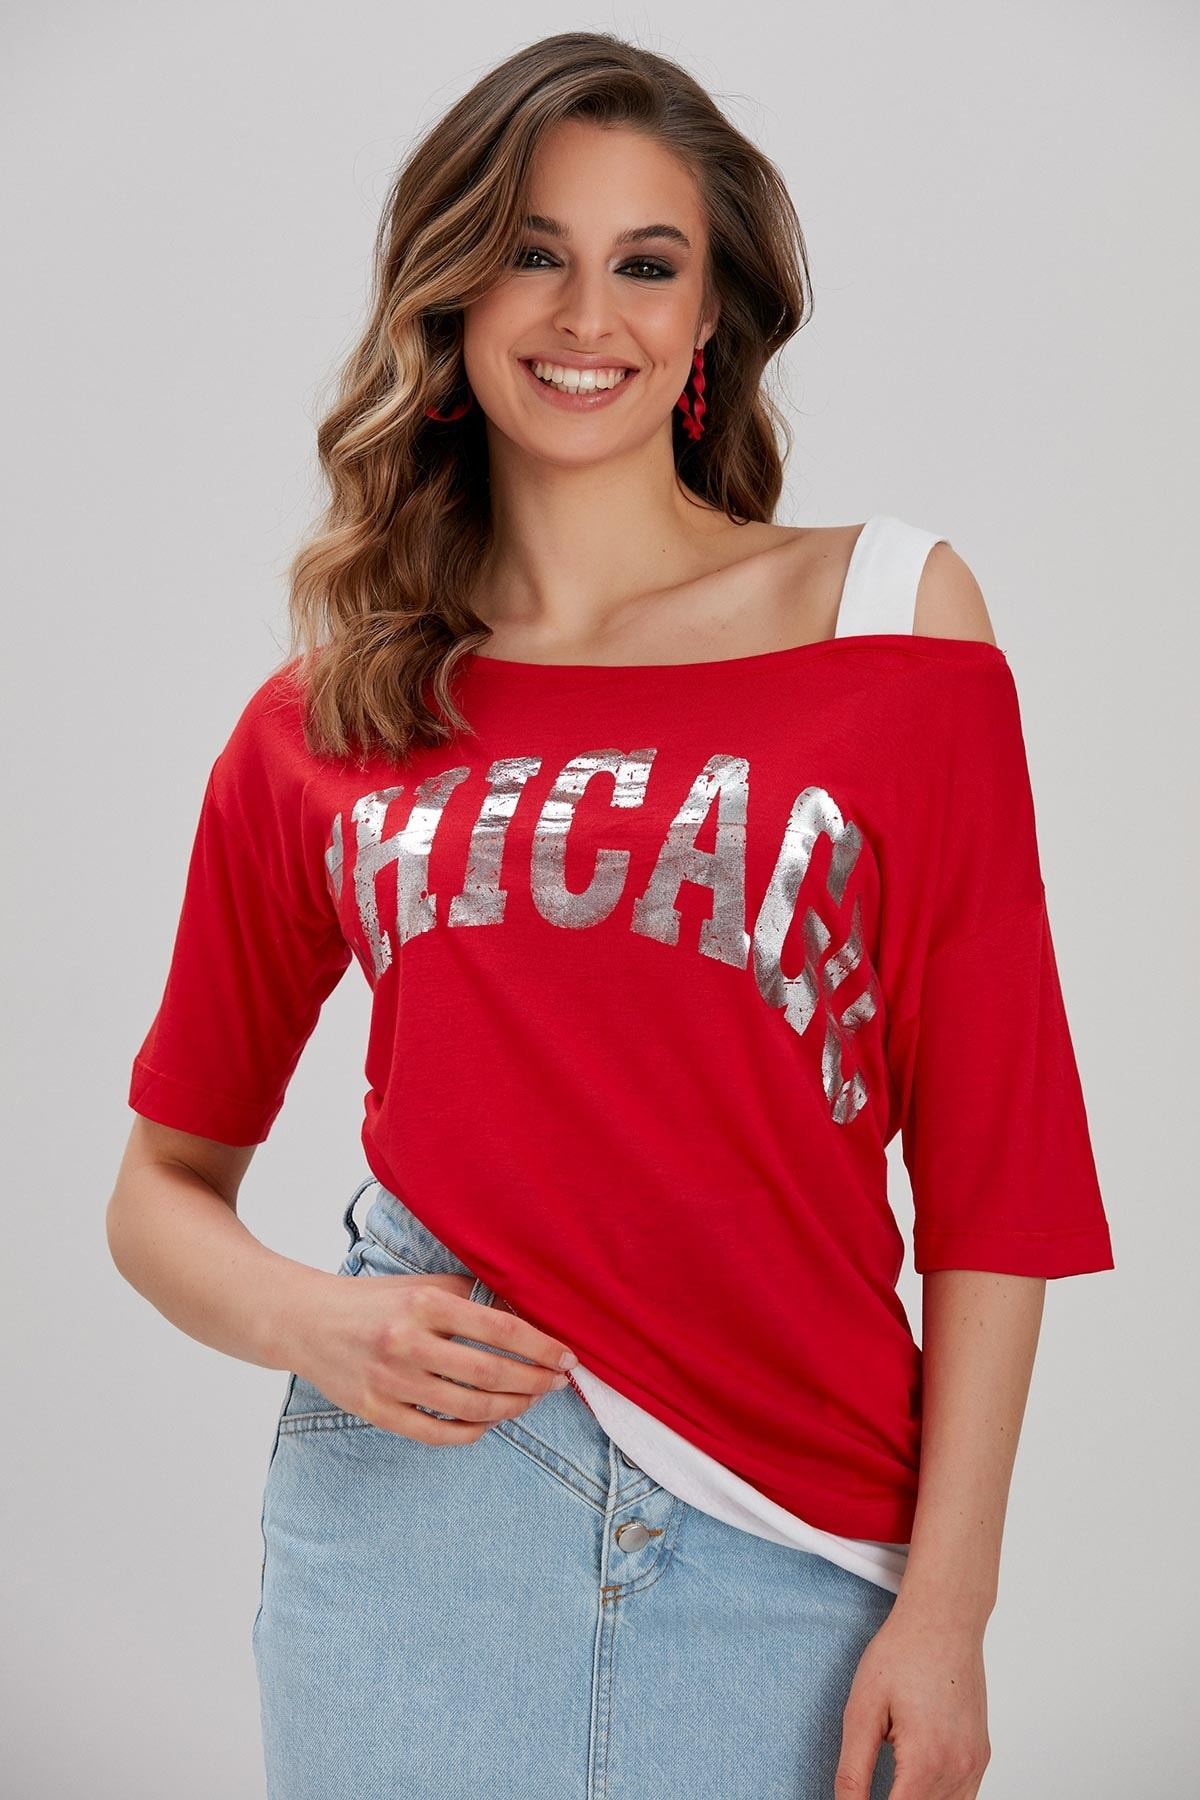 Y-London Kadın Kırmızı Yazı Baskılı Omuz Detaylı T-Shirt YL-TS99788